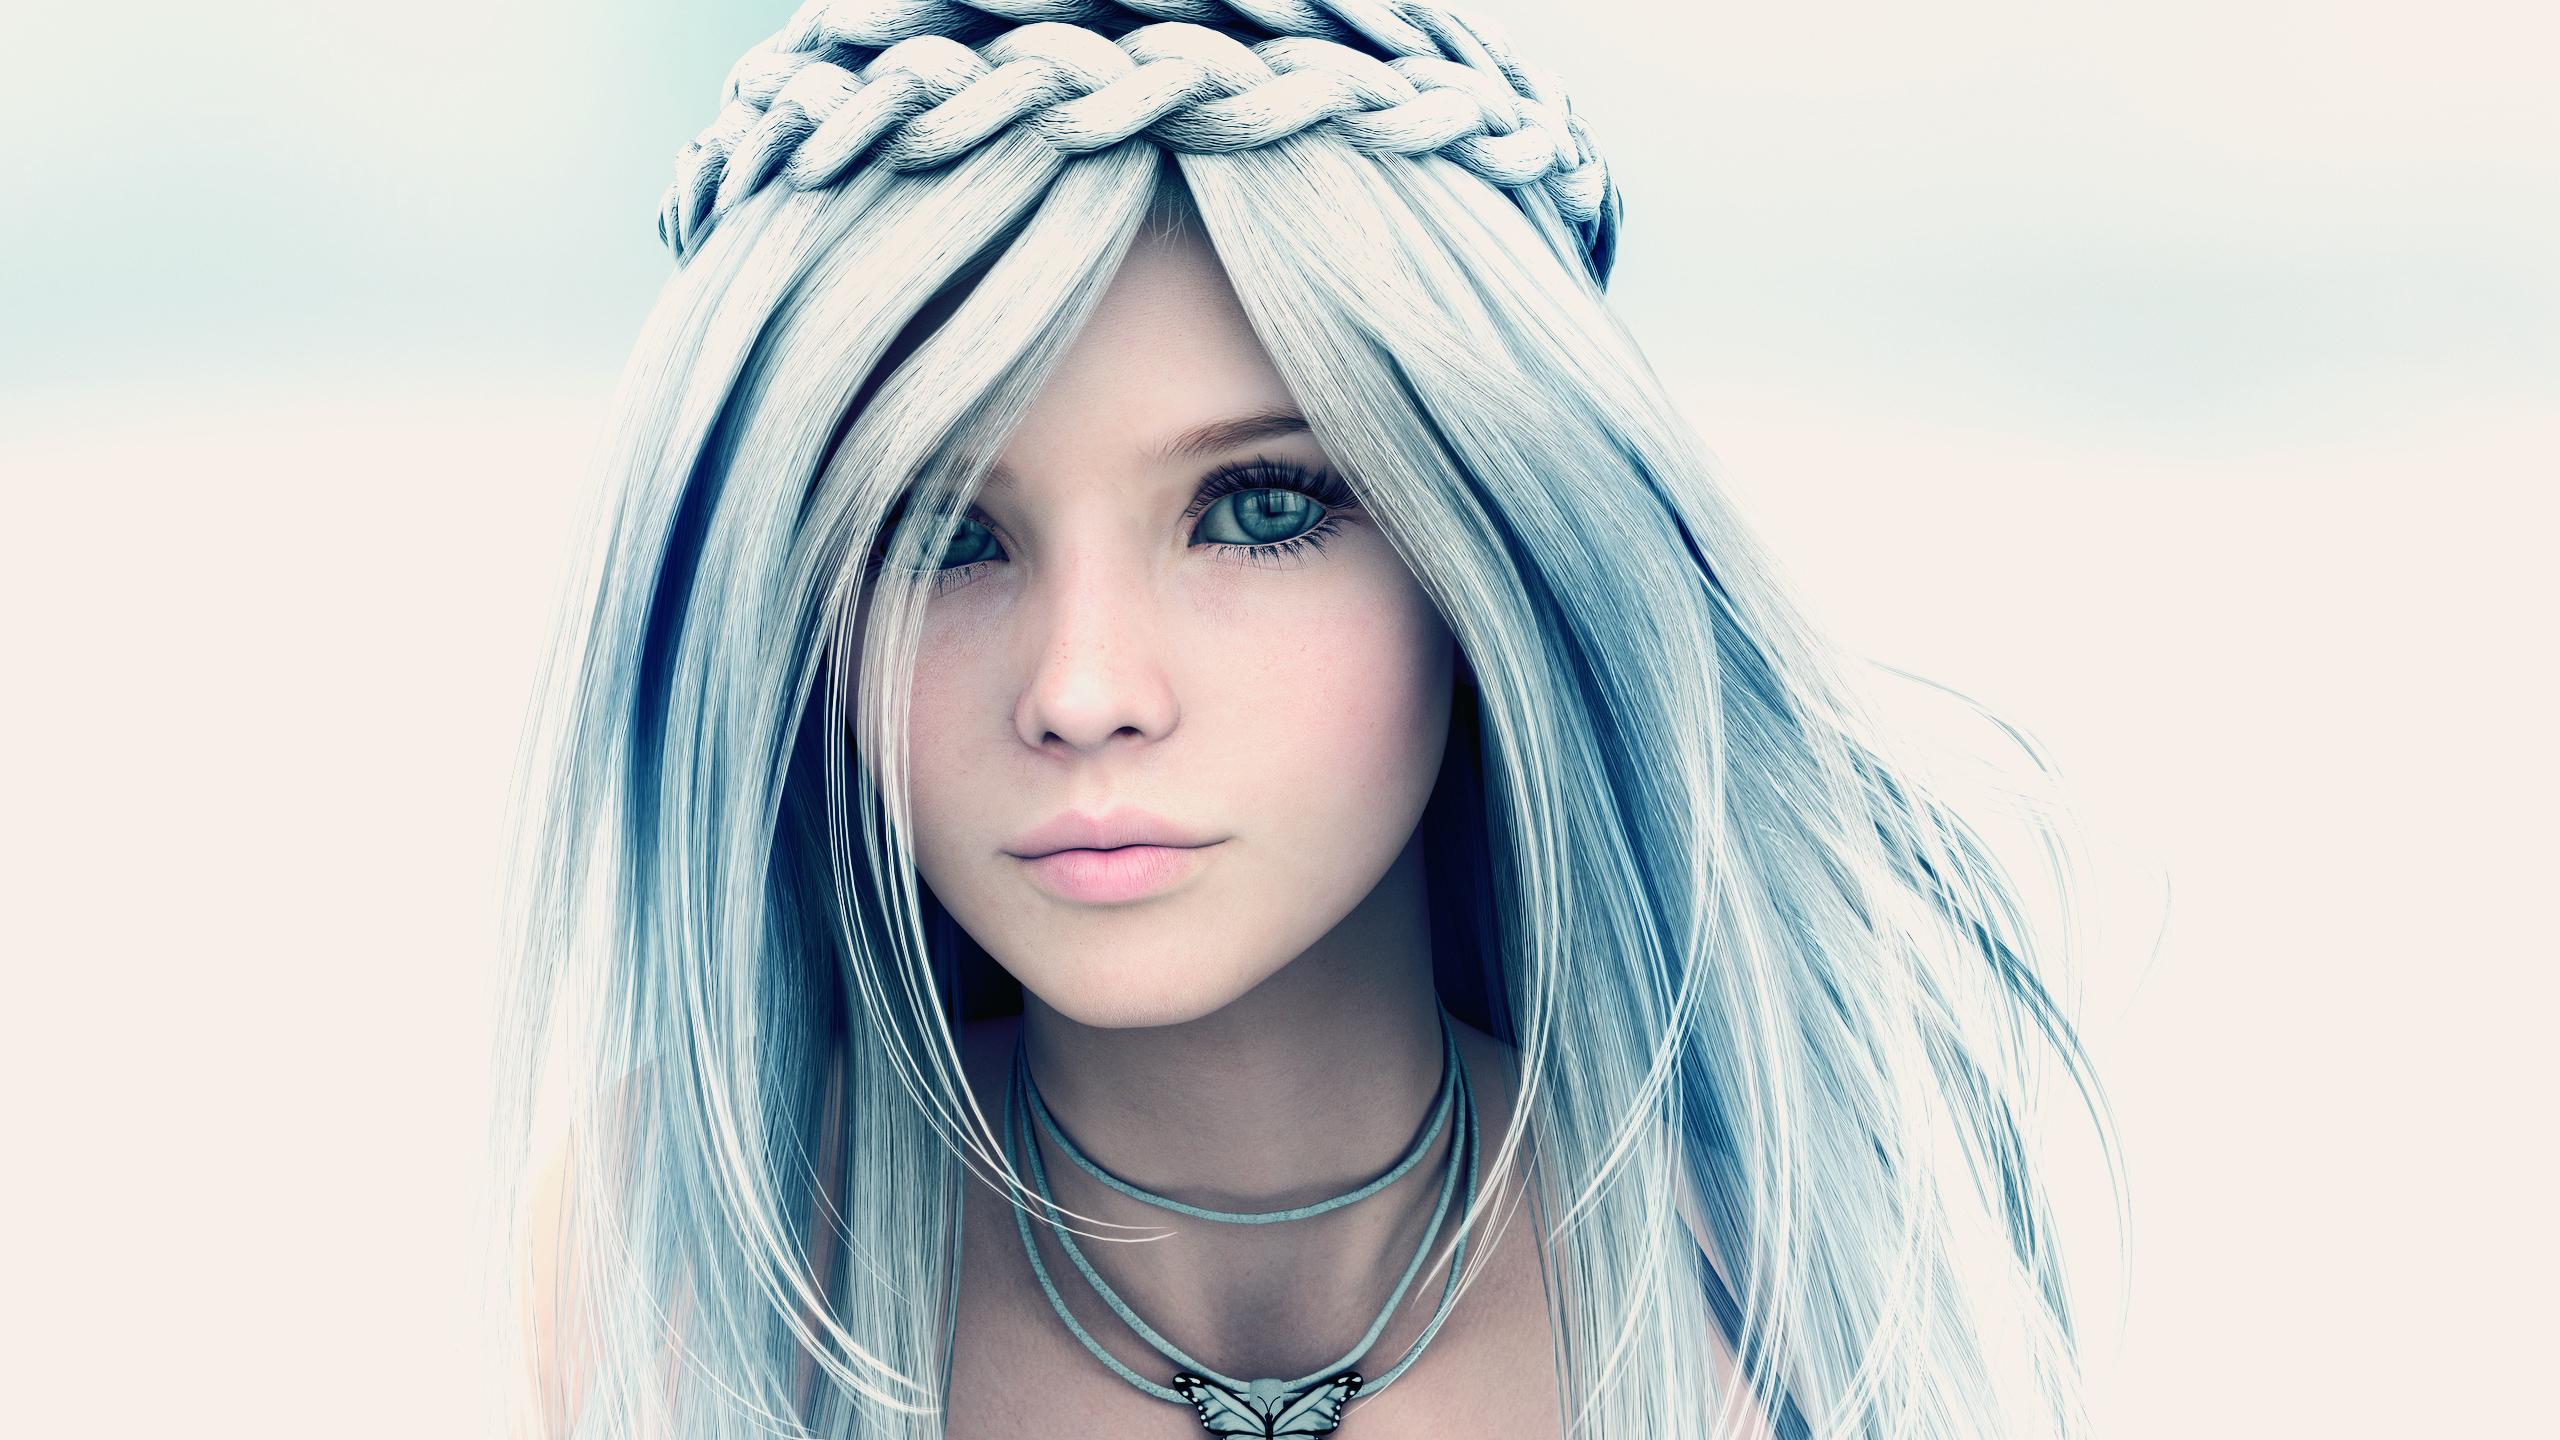 Wallpaper Face Model Long Hair 3d Blue Black Hair Clothing